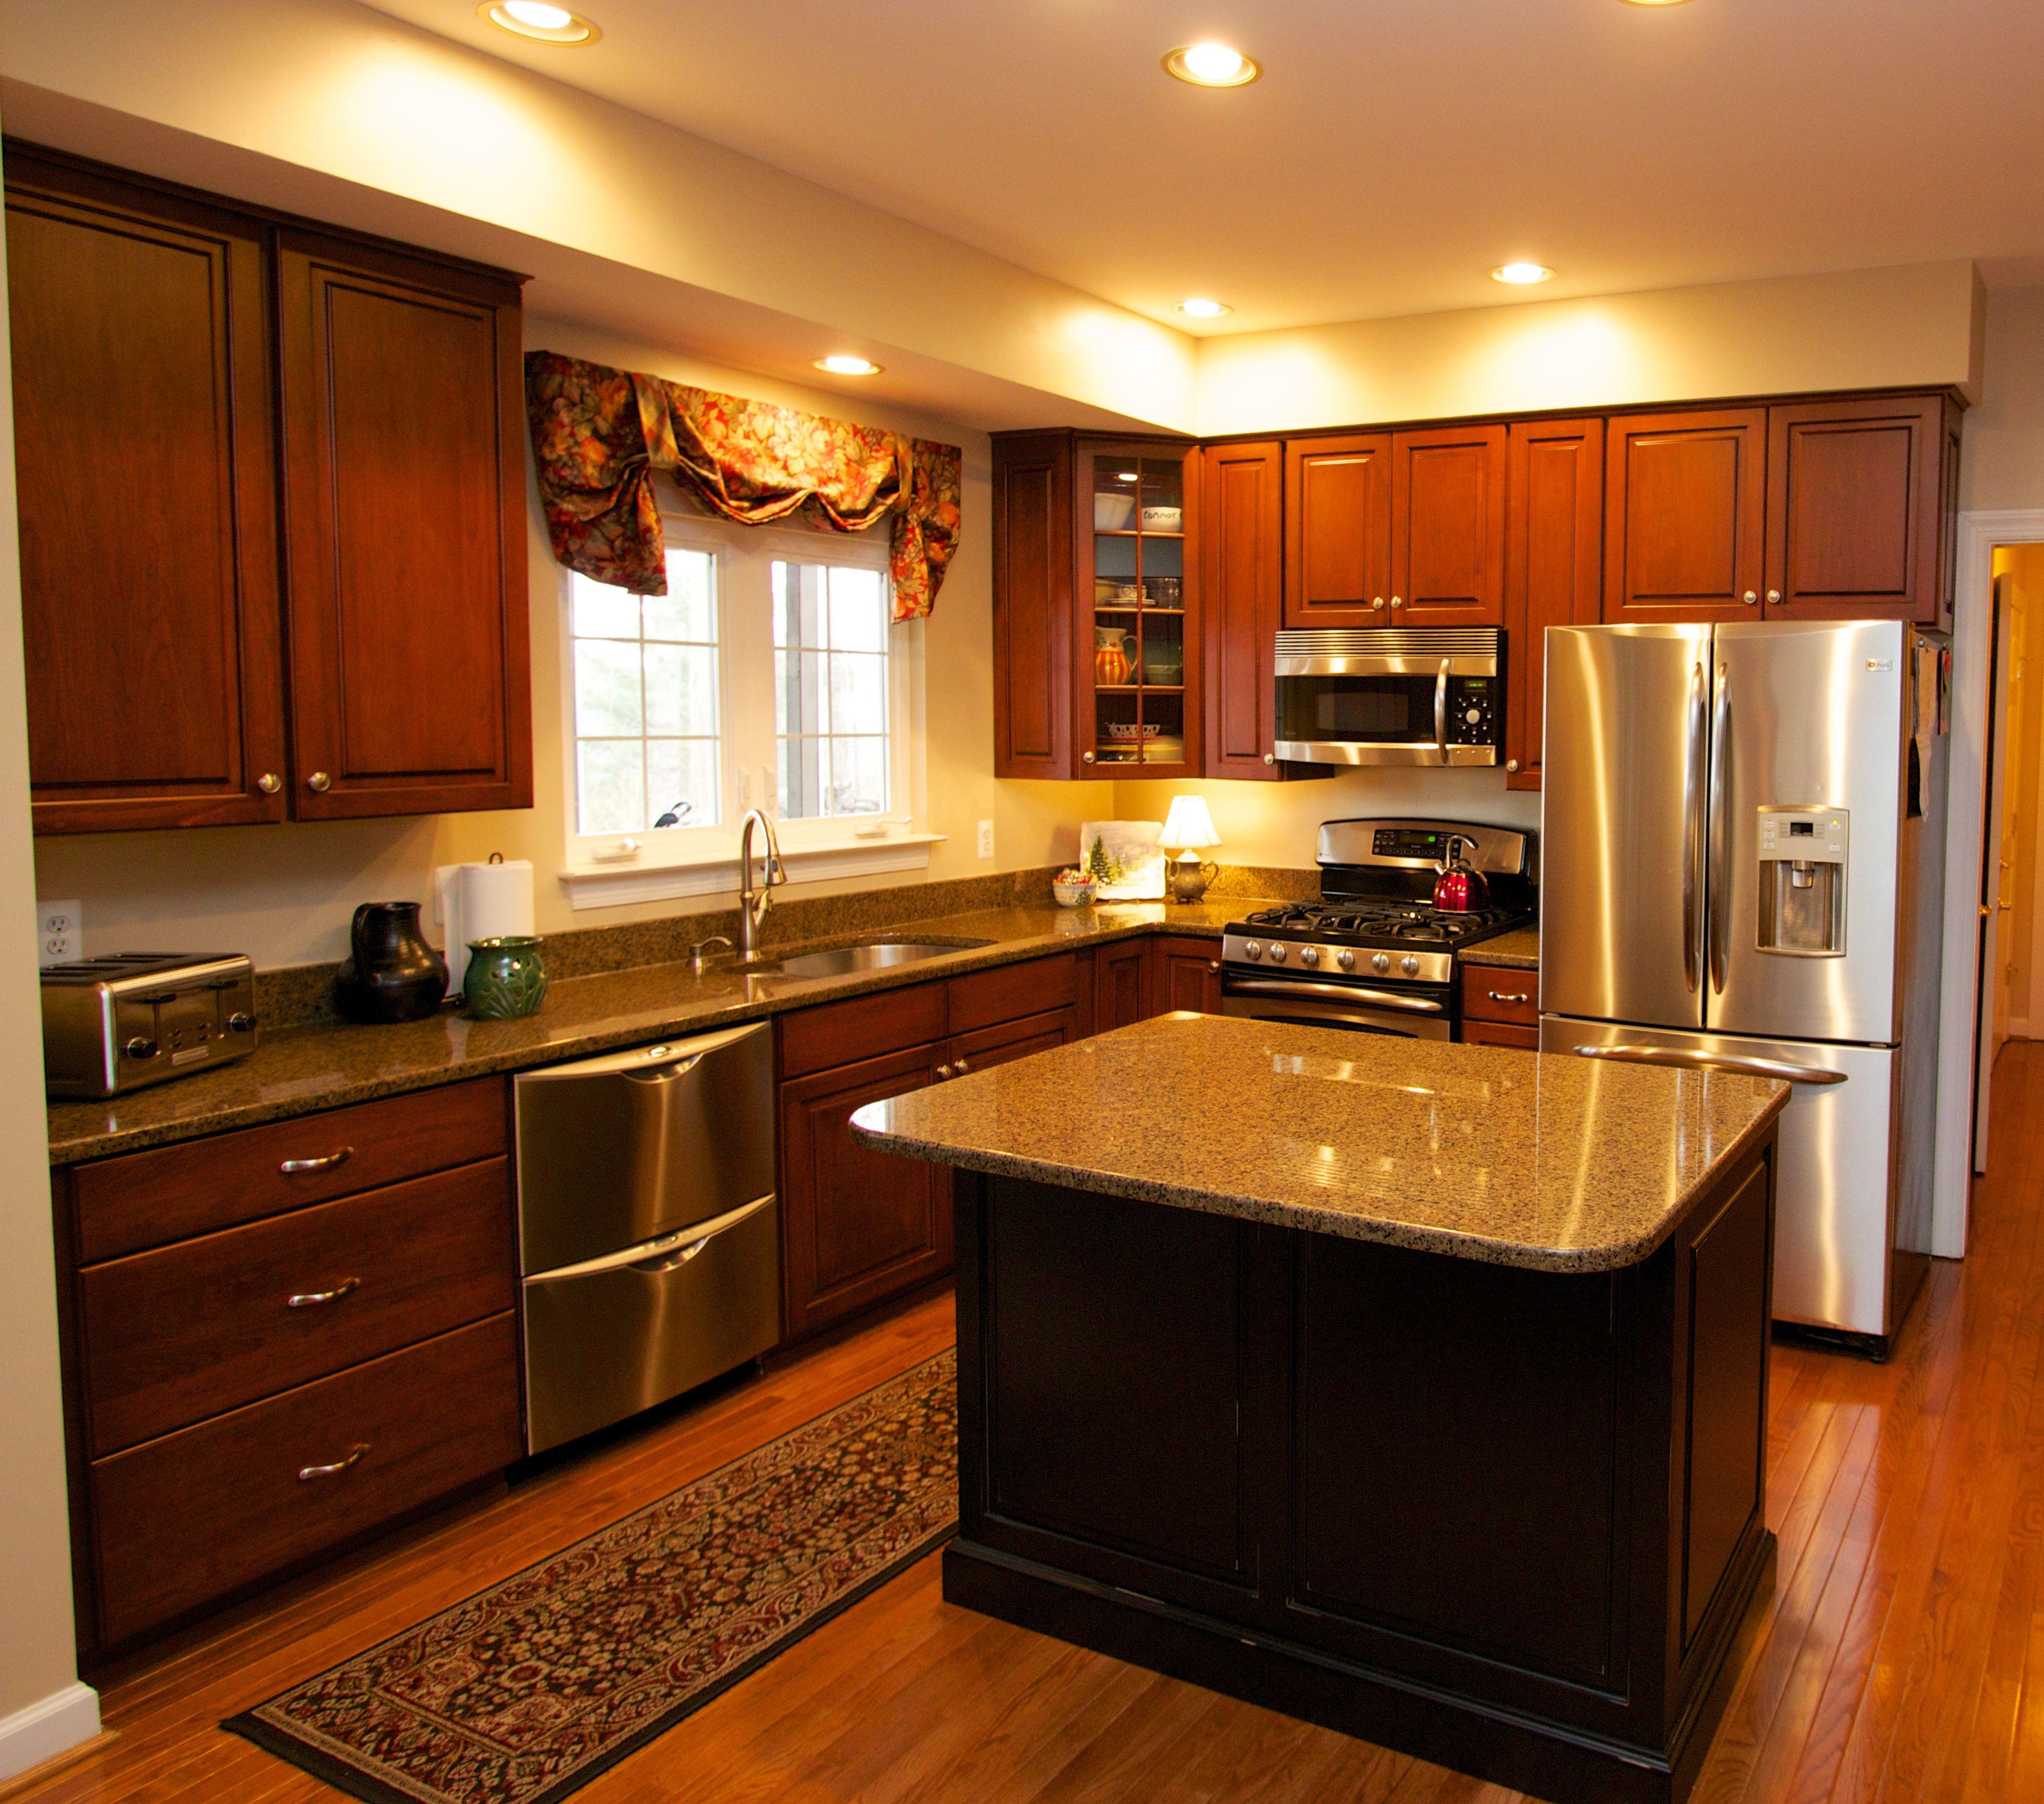 Home Page Kitchensaver Kitchen Cabinet Styles Kitchen Cherry Cabinets Kitchen